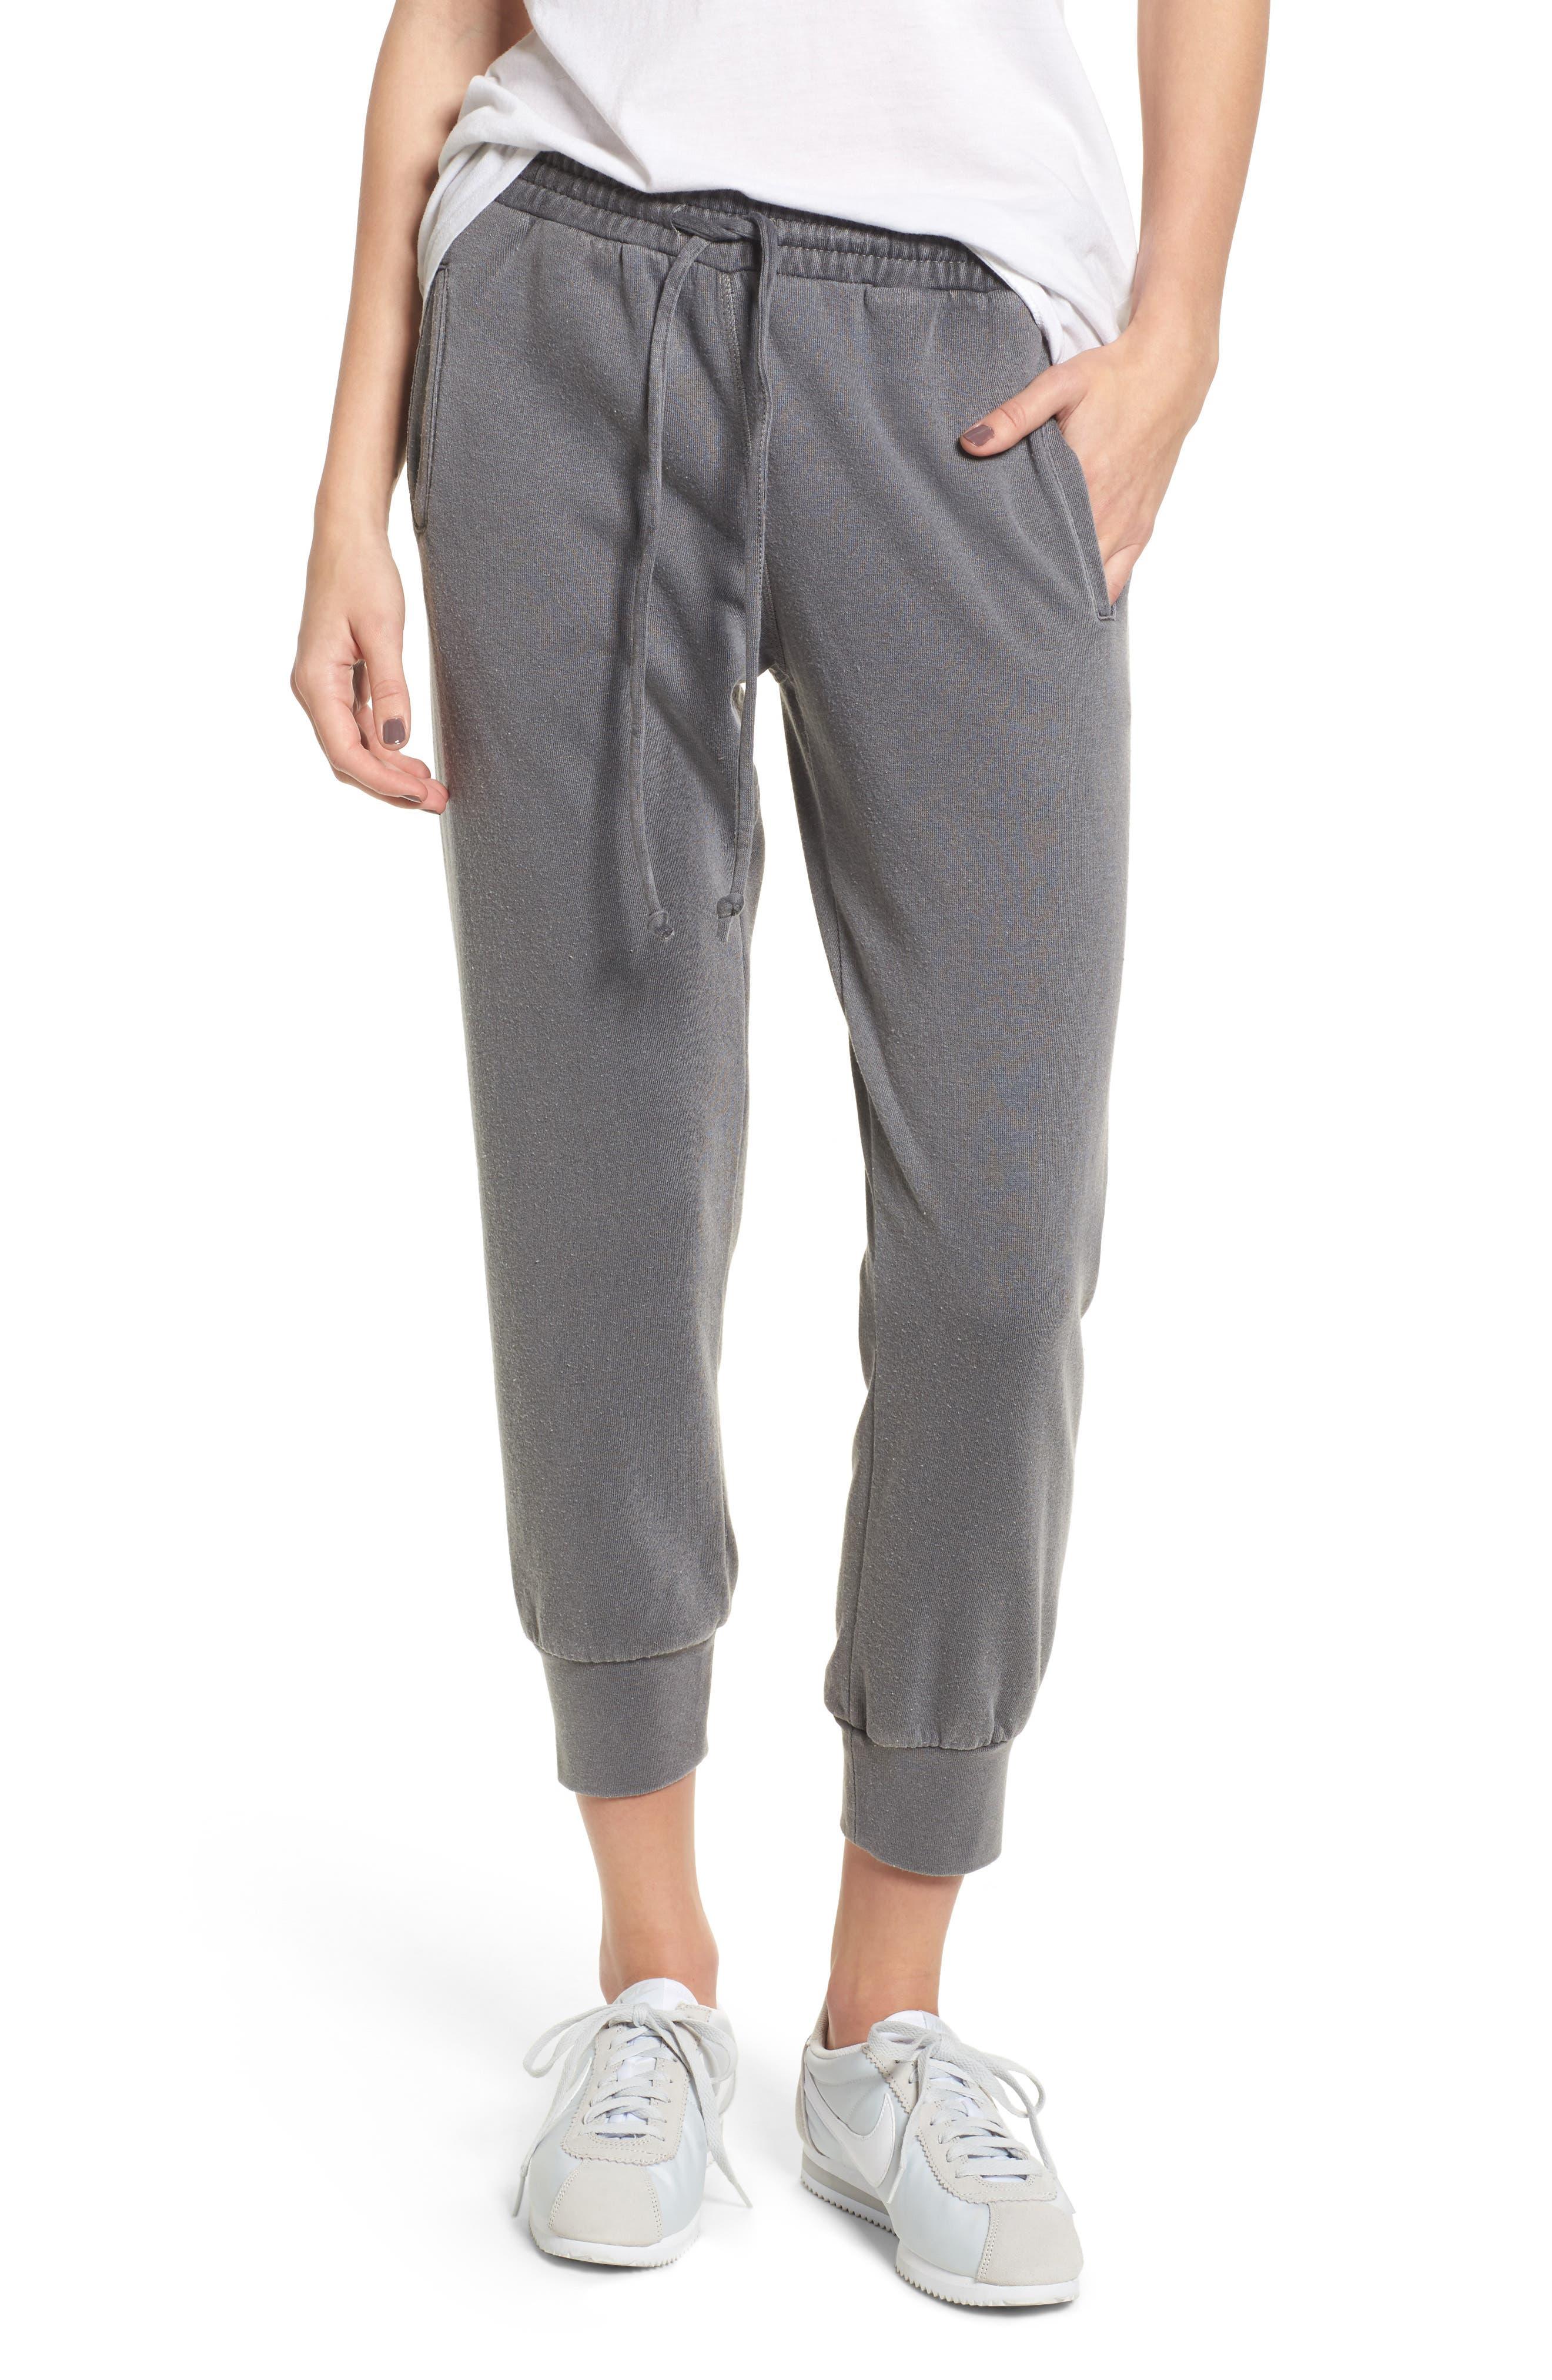 Cambridge Crop Sweatpants,                         Main,                         color, THUNDERSTORM